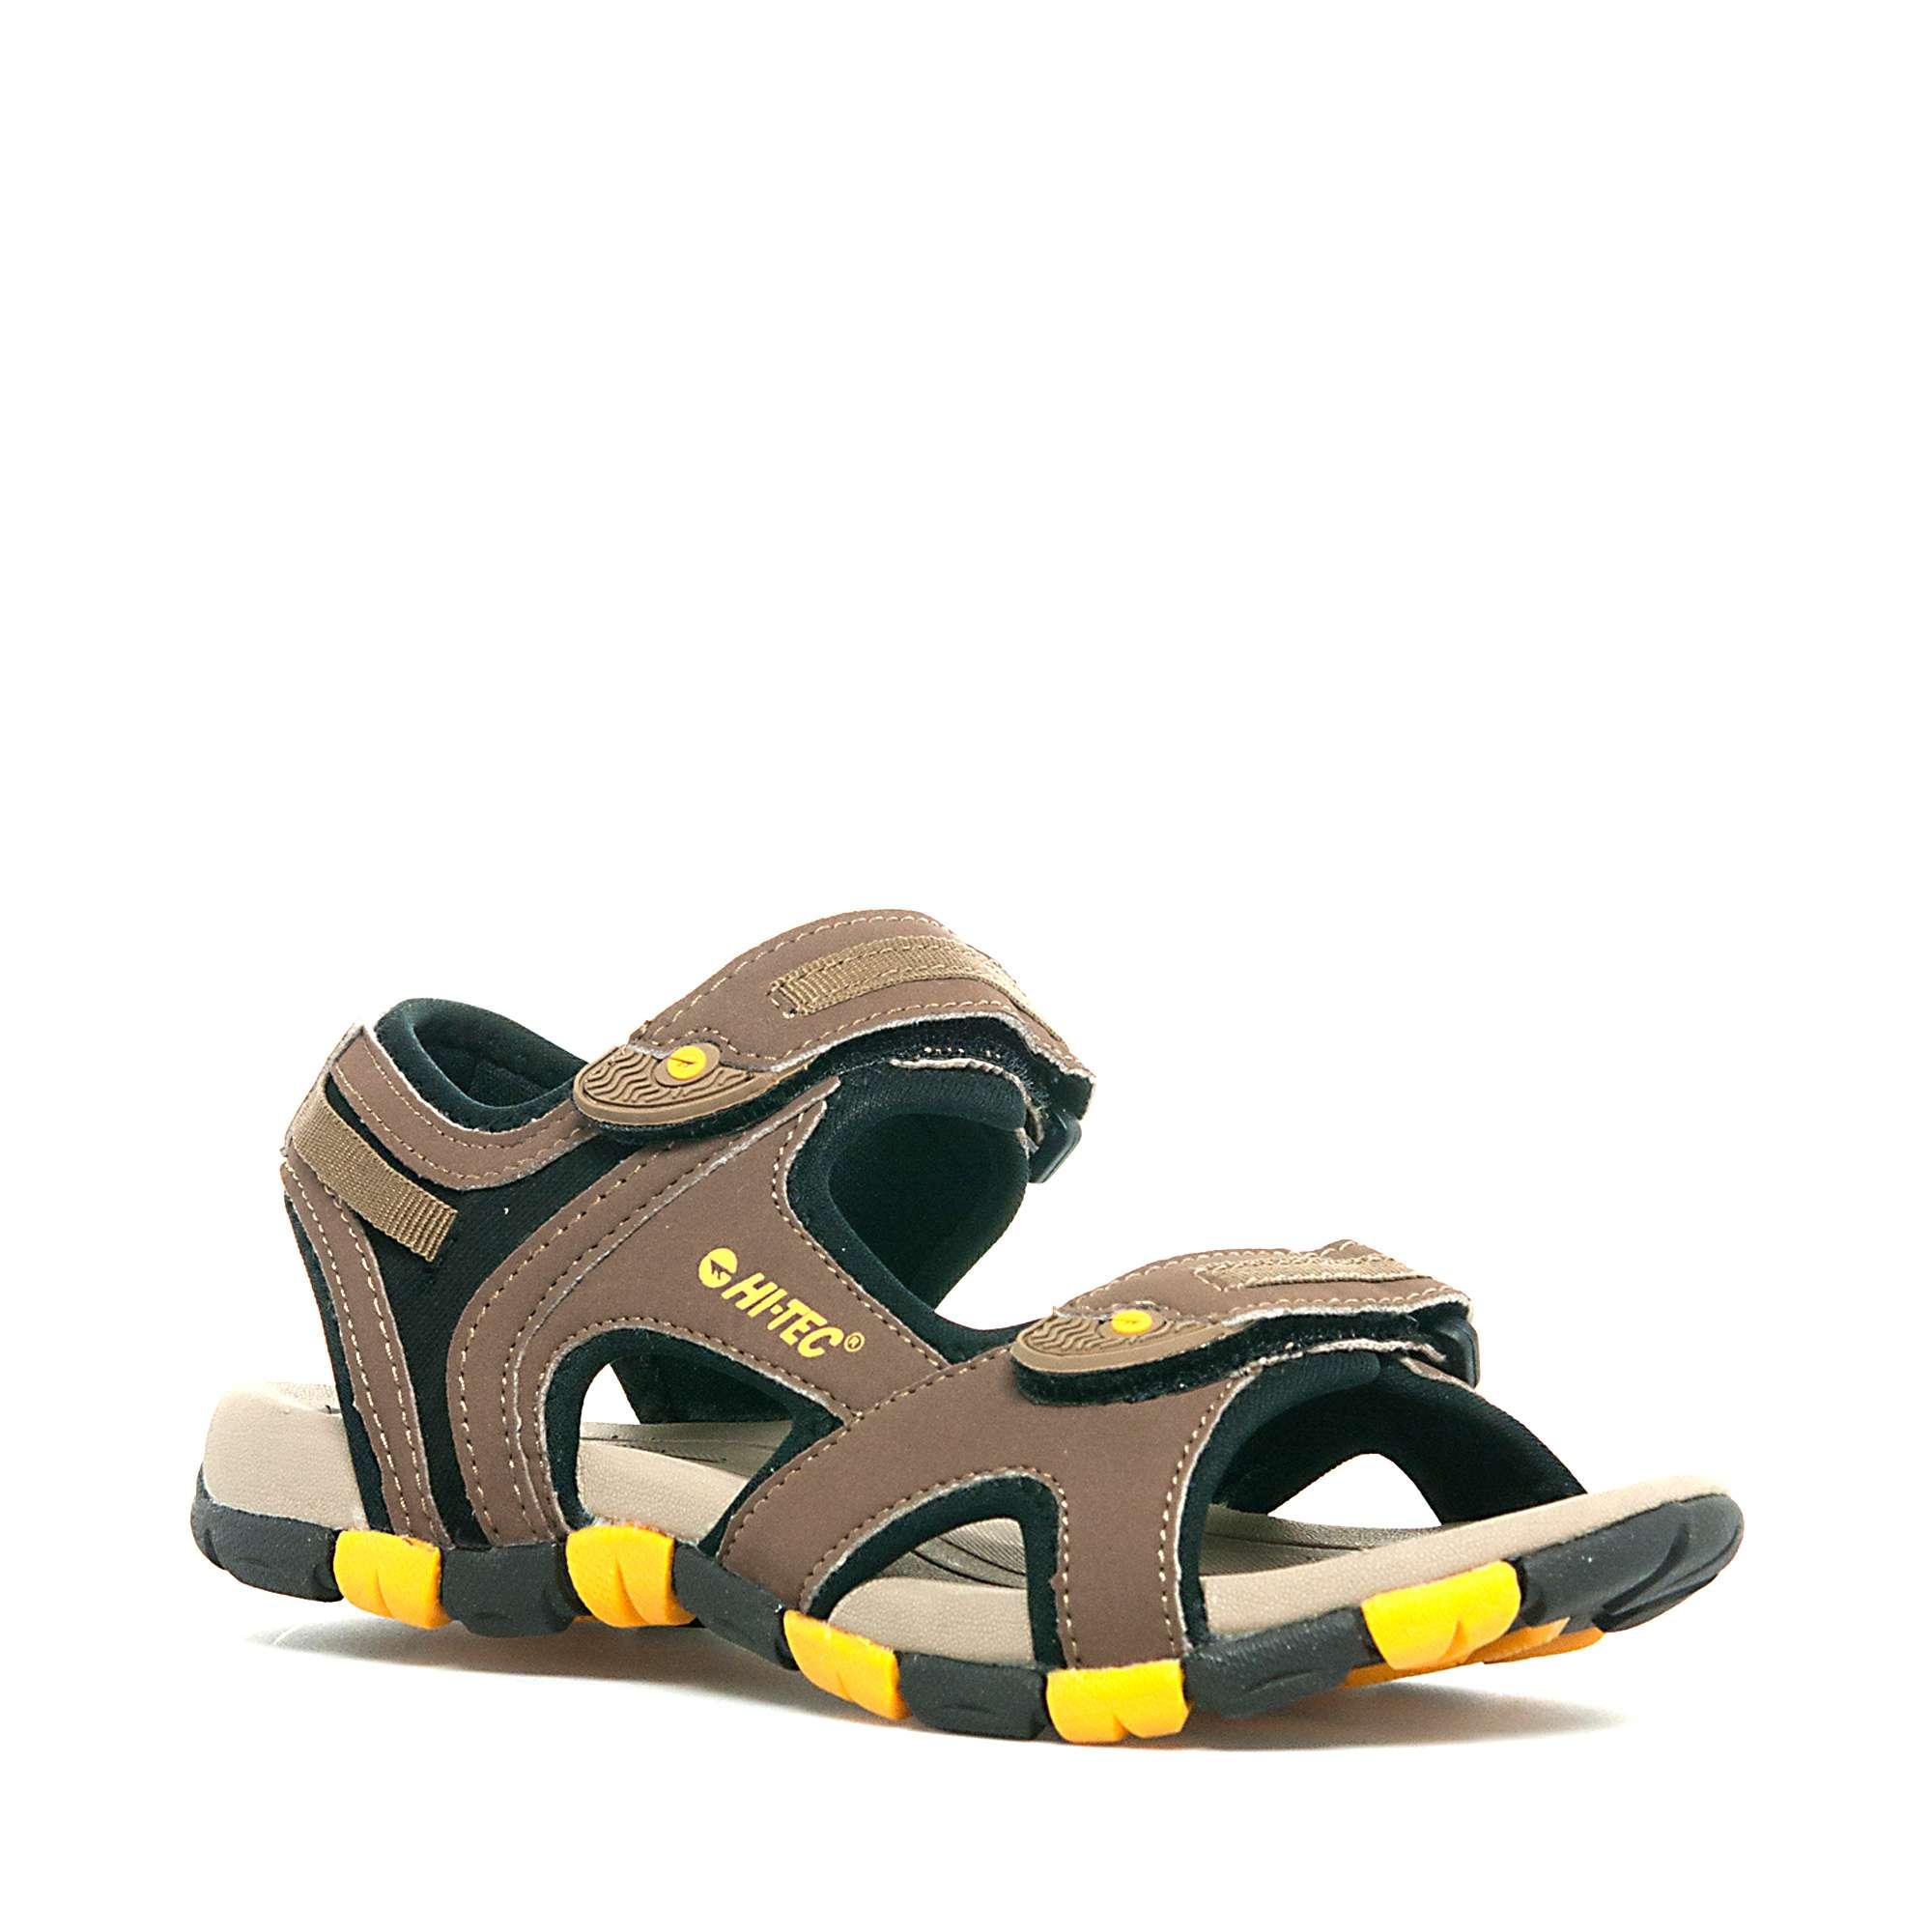 HI TEC Boys' GT Strap Sandal